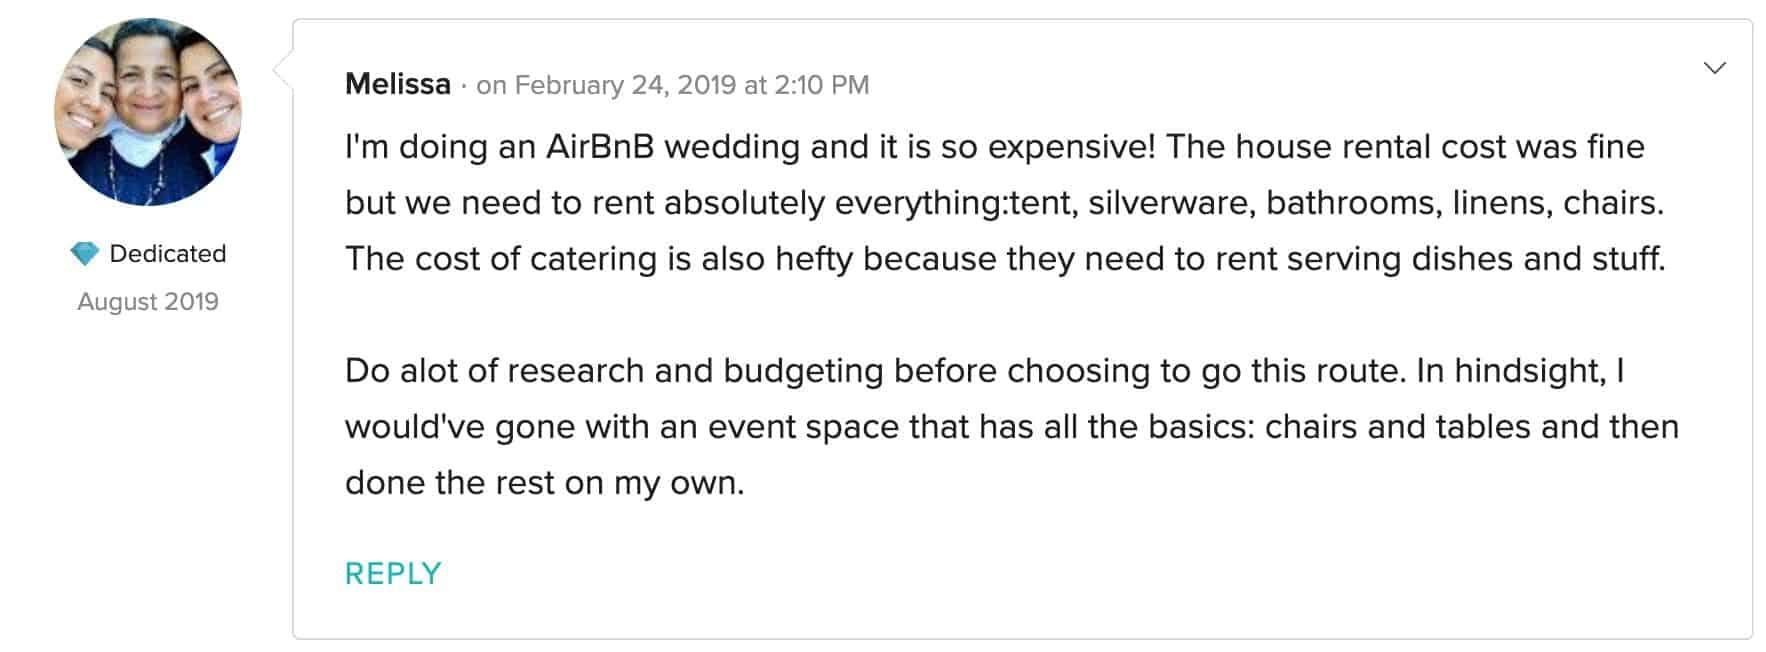 2 airbnb wedding venue california